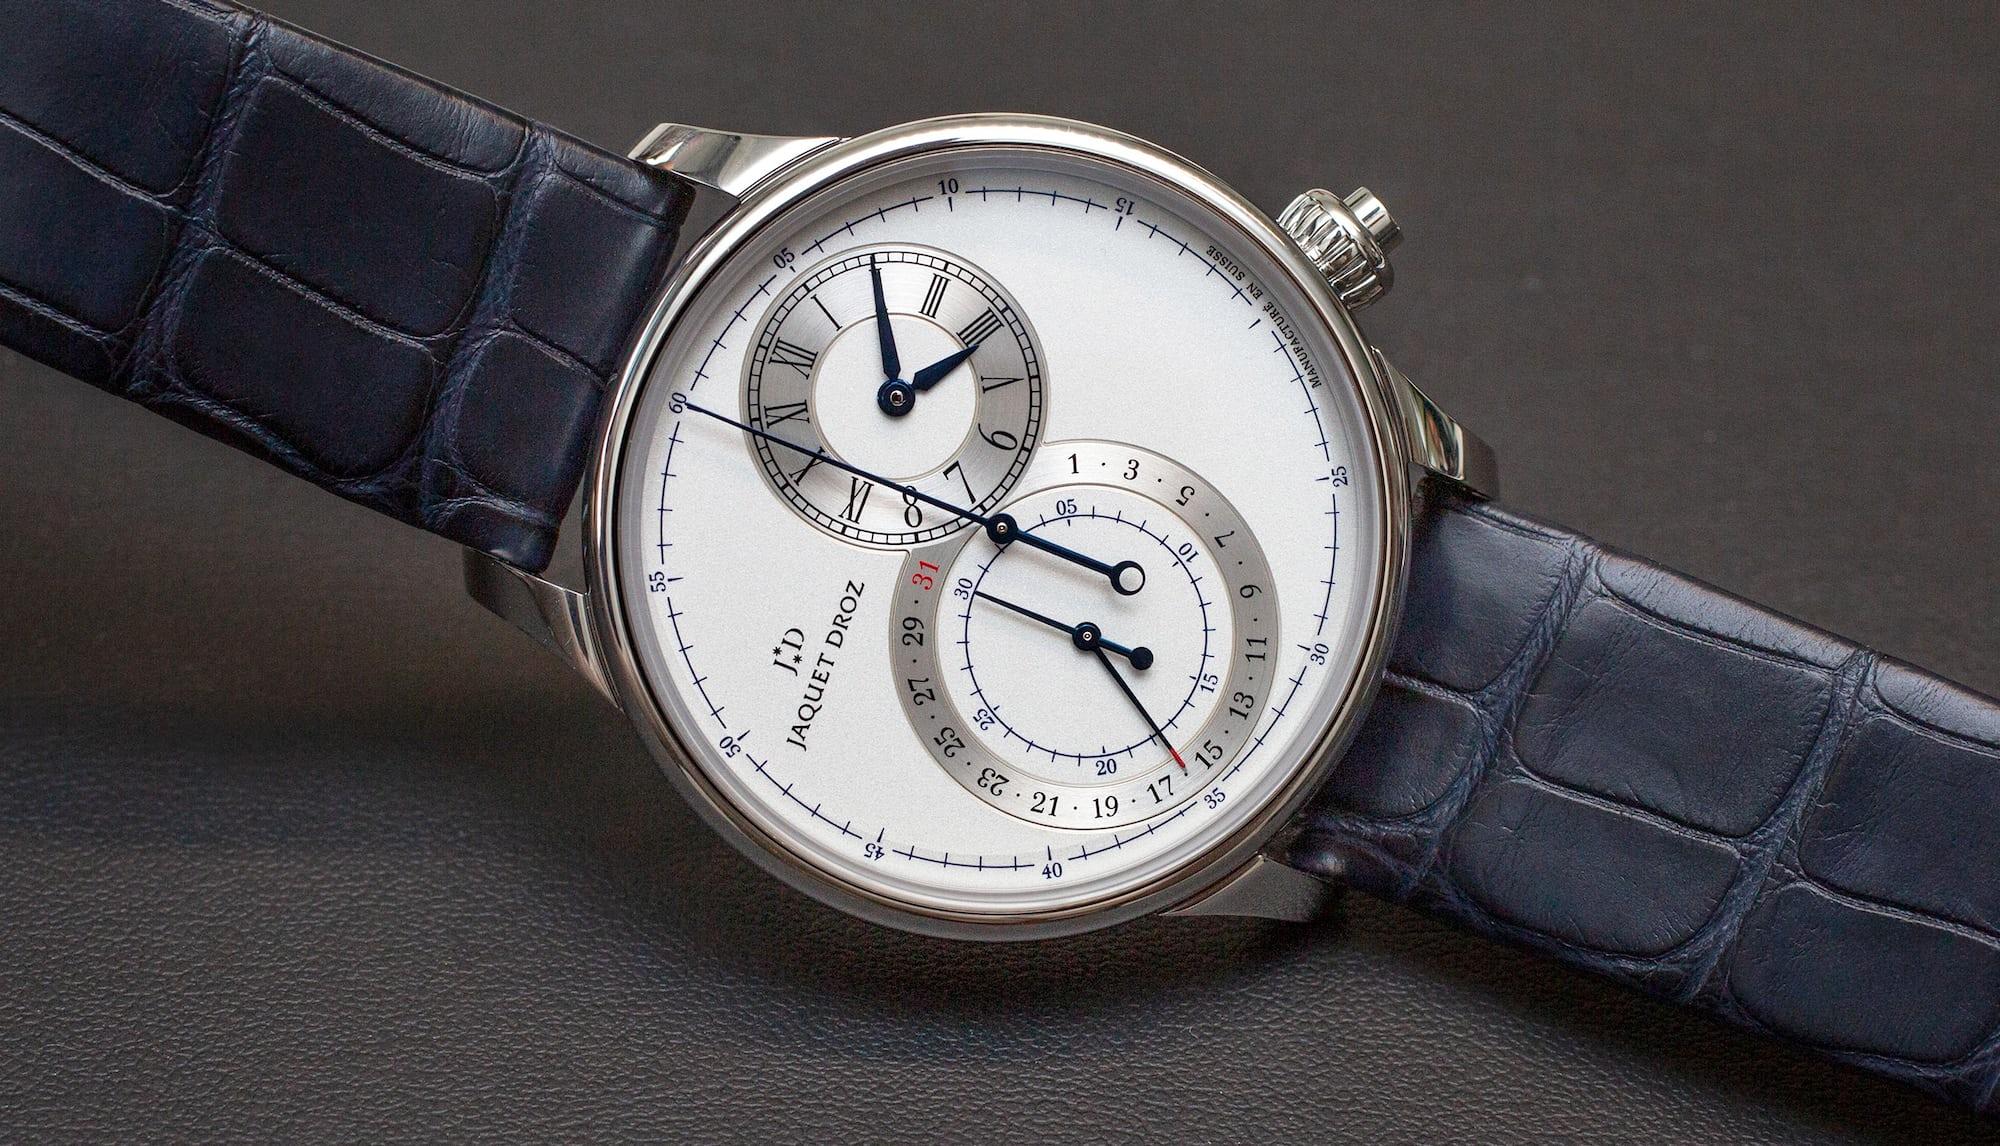 Introducing: The Jaquet Droz Grande Seconde Chronograph